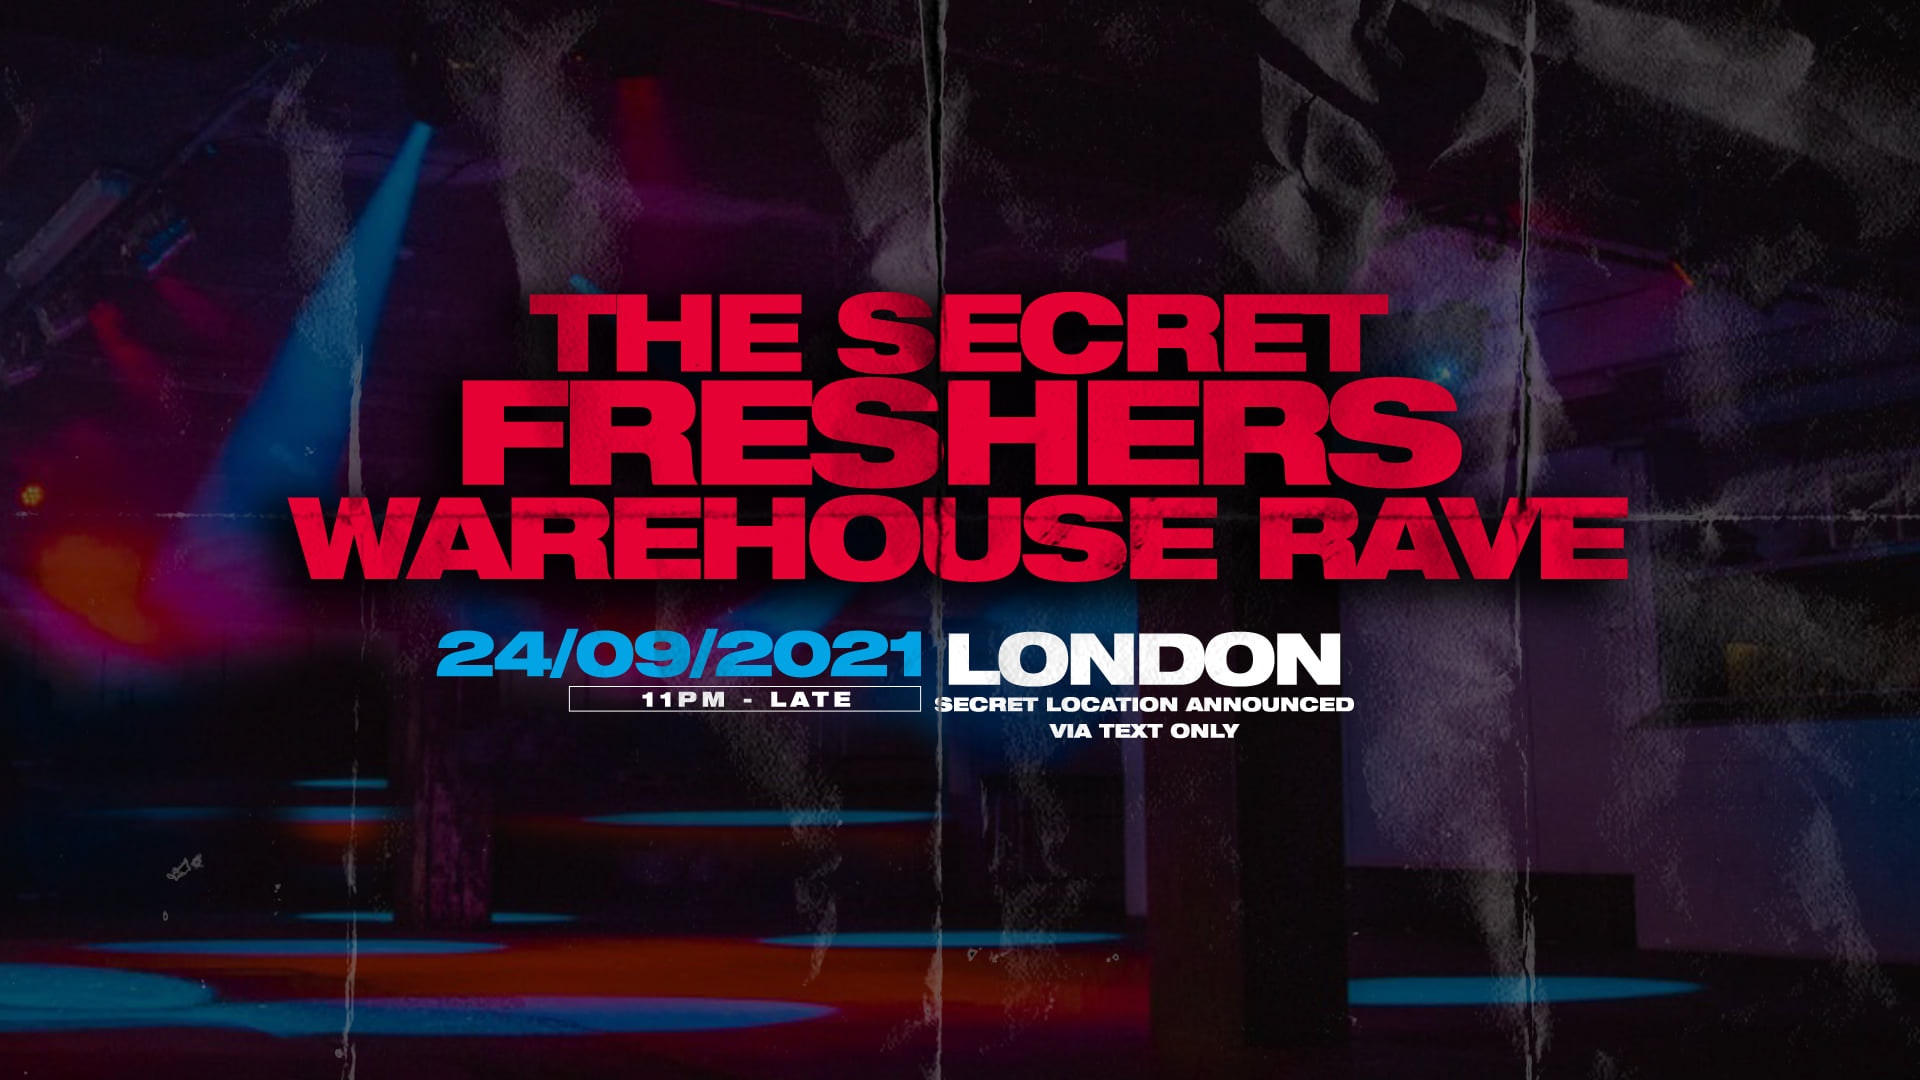 The Secret Freshers Warehouse Rave – London : ON SALE NOW!